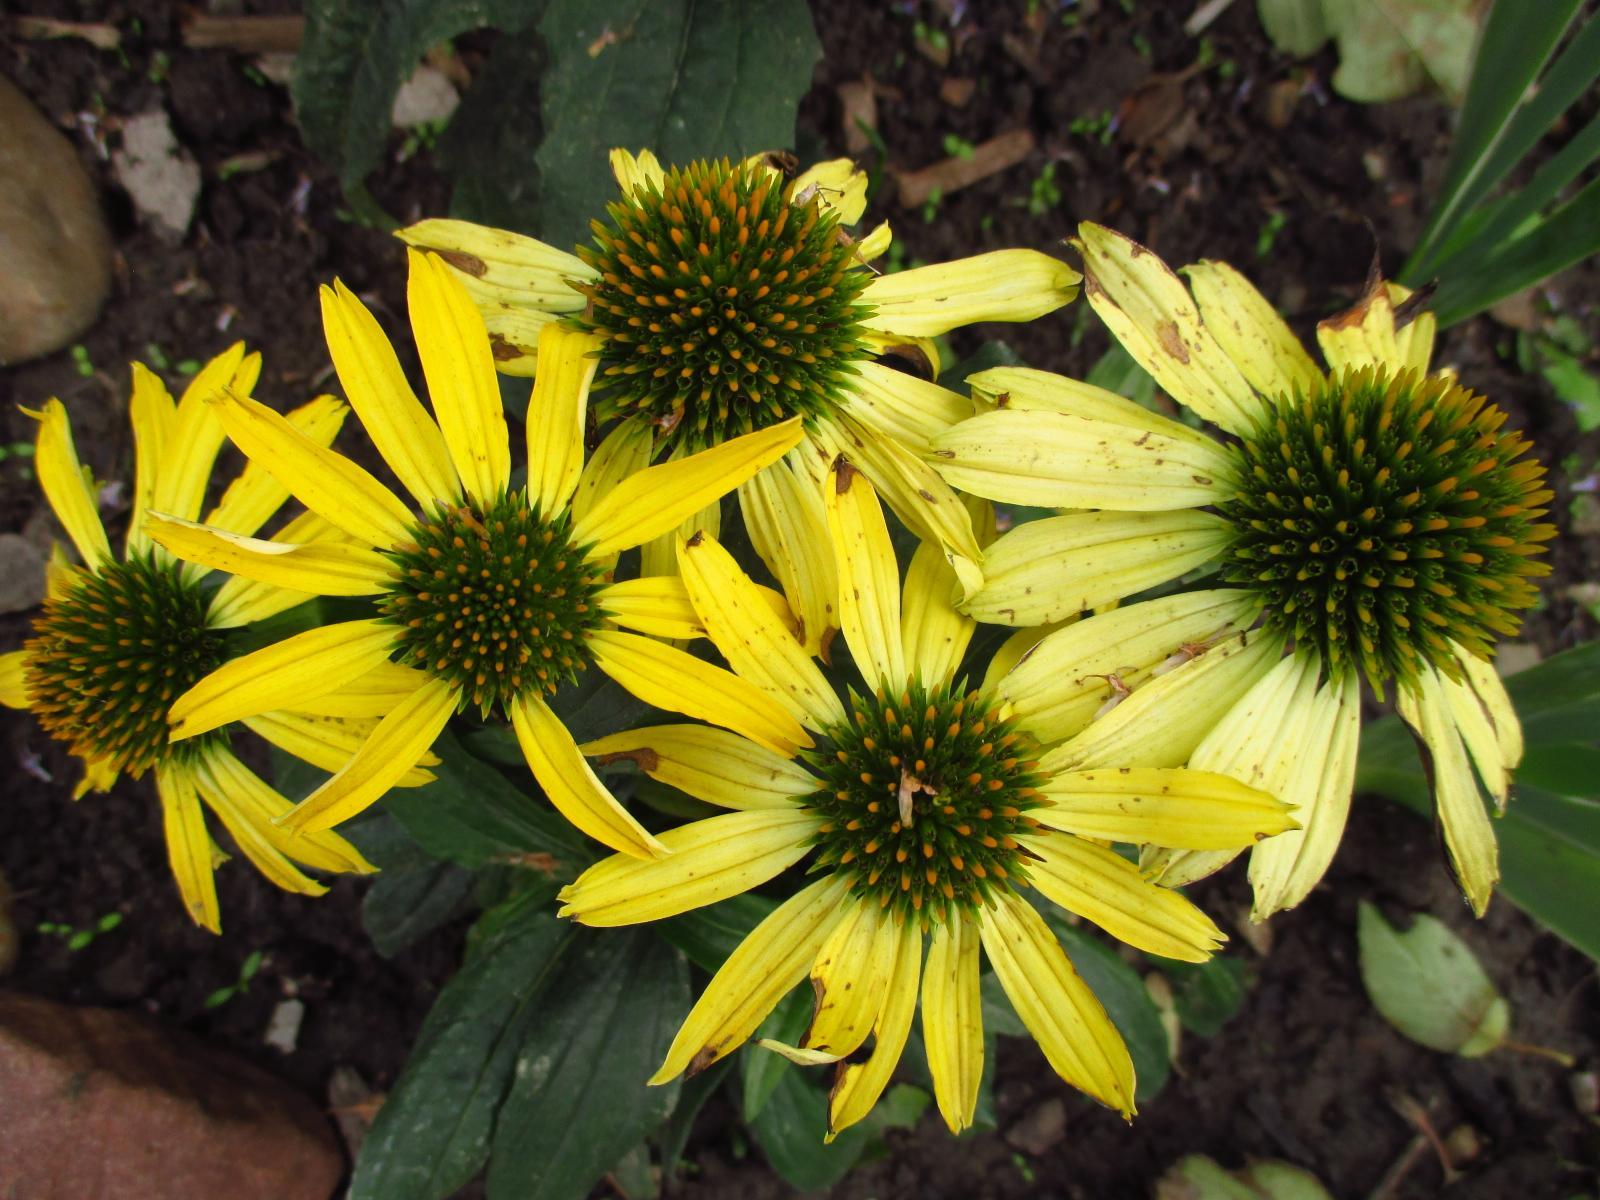 Echinacea purpurová a žltá - Obrázok č. 4